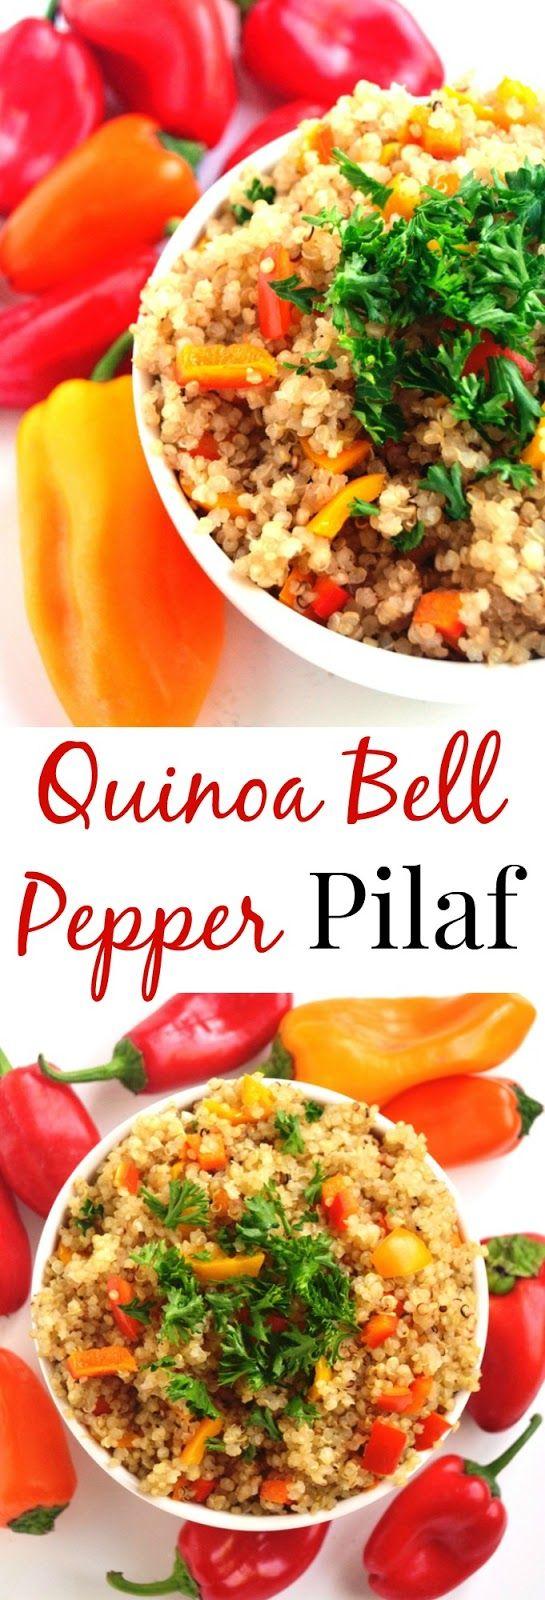 Photo of Quinoa Bell Pepper Pilaf